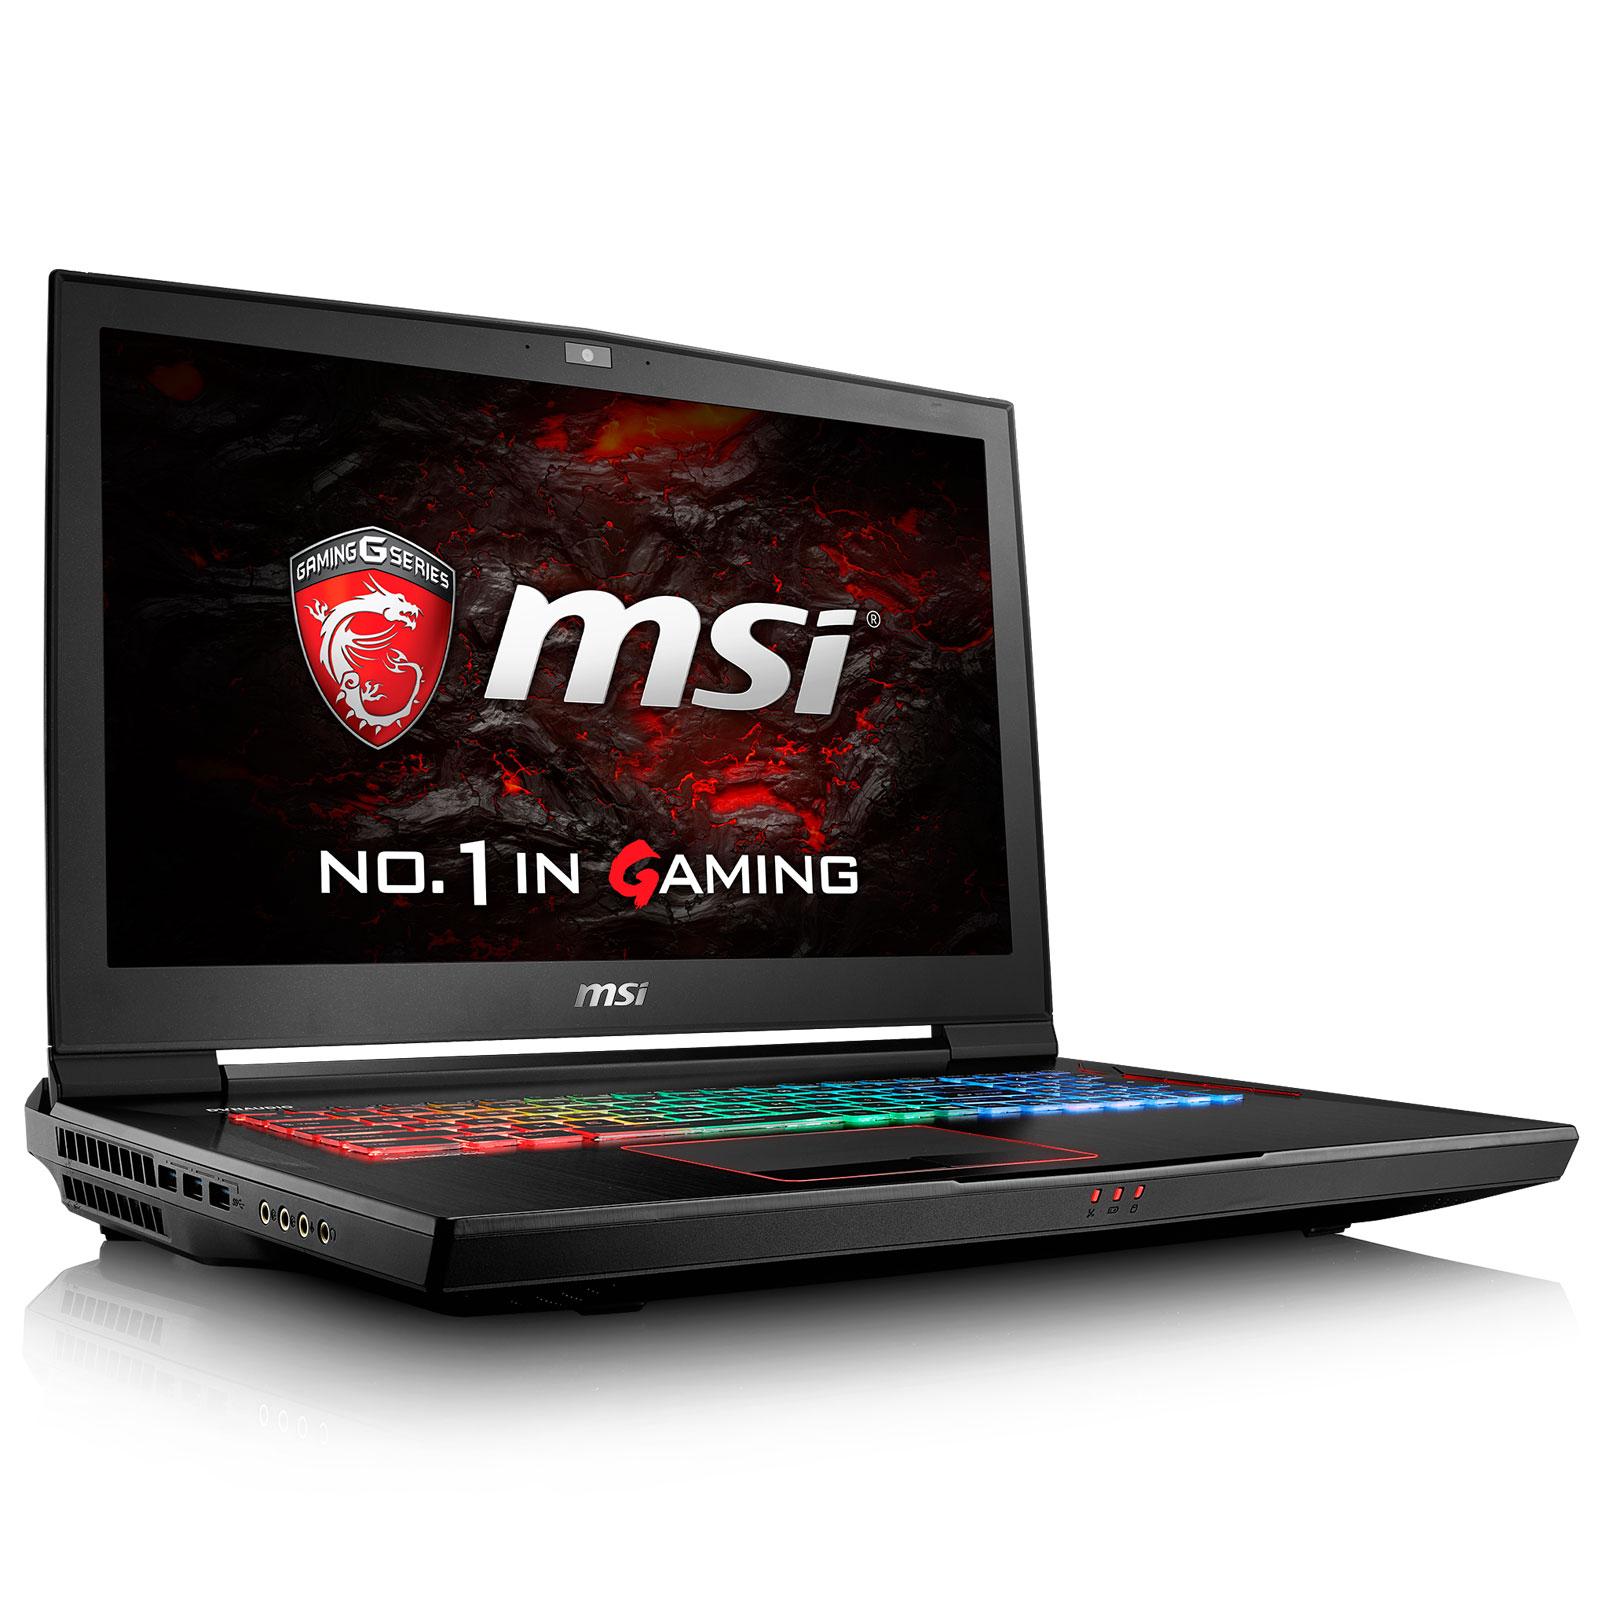 "PC portable MSI GT73VR 6RF-258FR Titan Pro Intel Core i7-6700HQ 16 Go SSD 256 Go + HDD 1 To 17.3"" LED Full HD 120 Hz NVIDIA GeForce GTX 1080 Wi-Fi AC/Bluetooth Webcam Windows 10 Famille 64 bits (garantie constructeur 2 ans)"